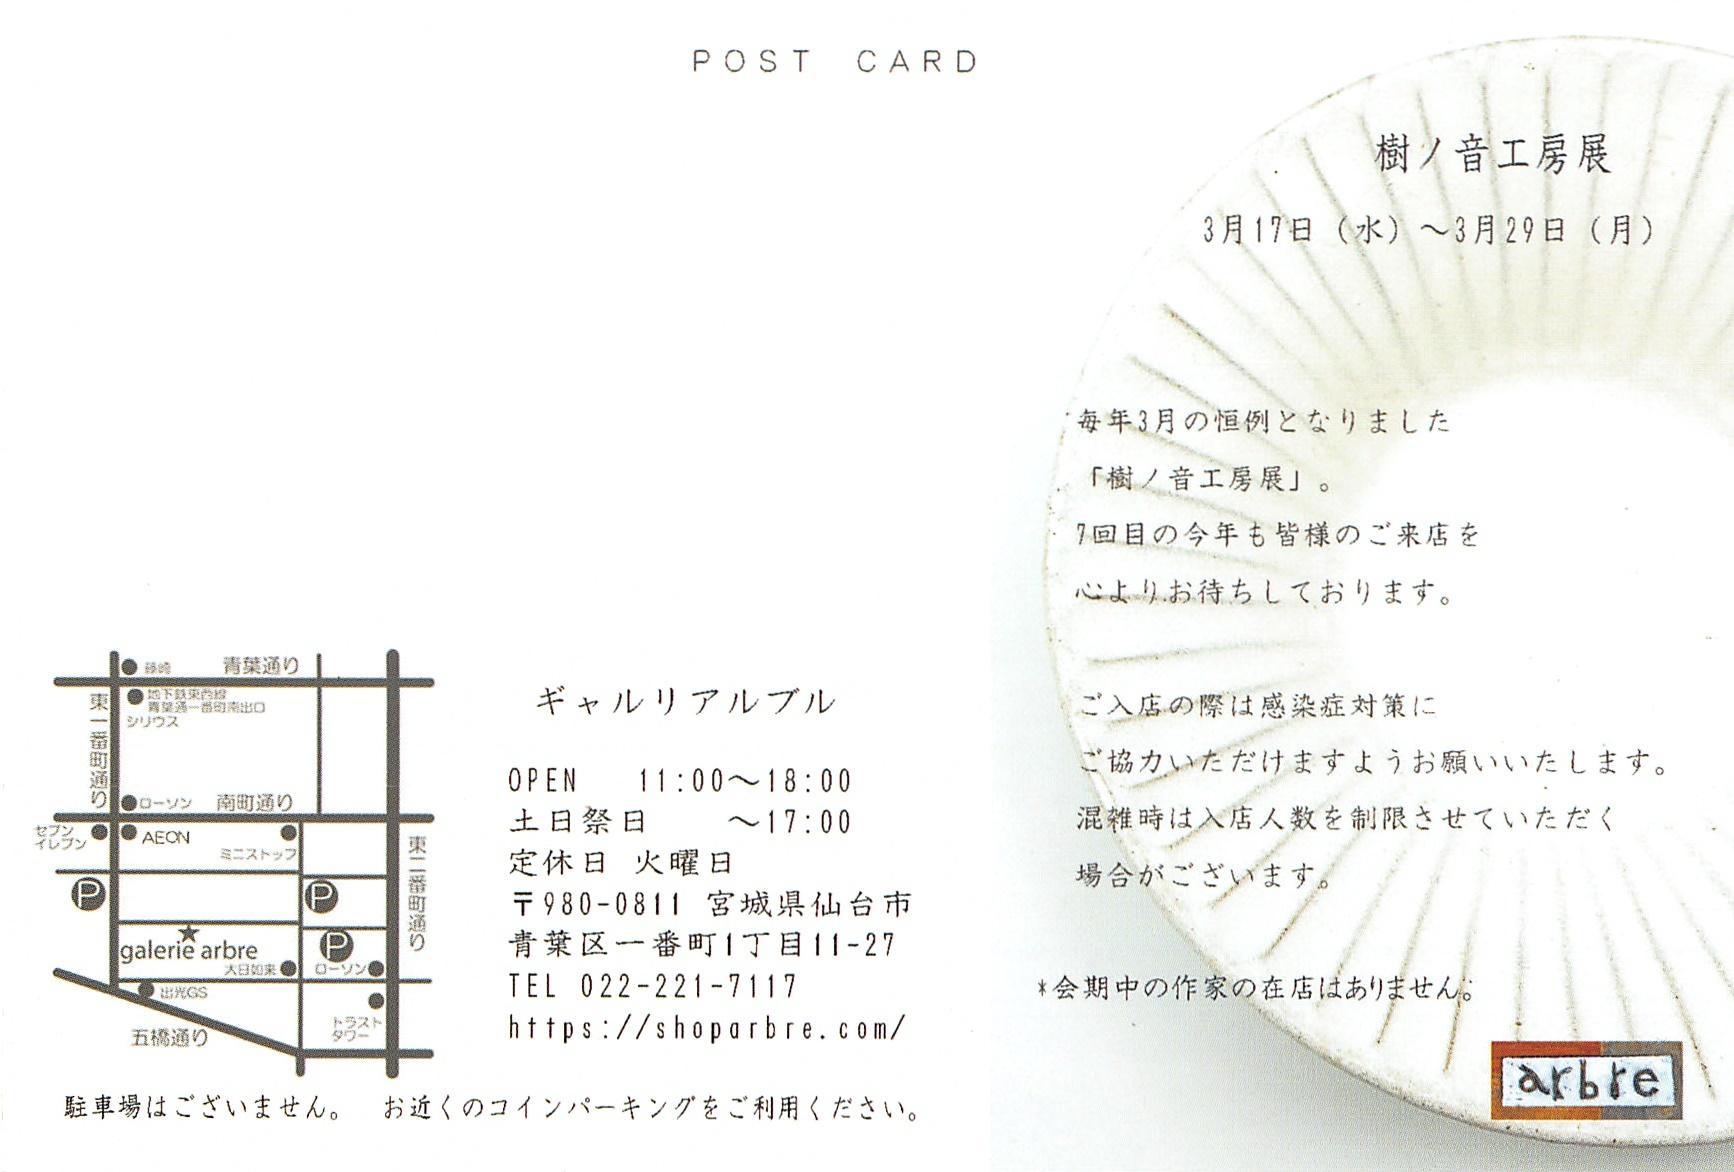 galerie arbre『樹ノ音工房展』2021。_e0114422_15014101.jpg